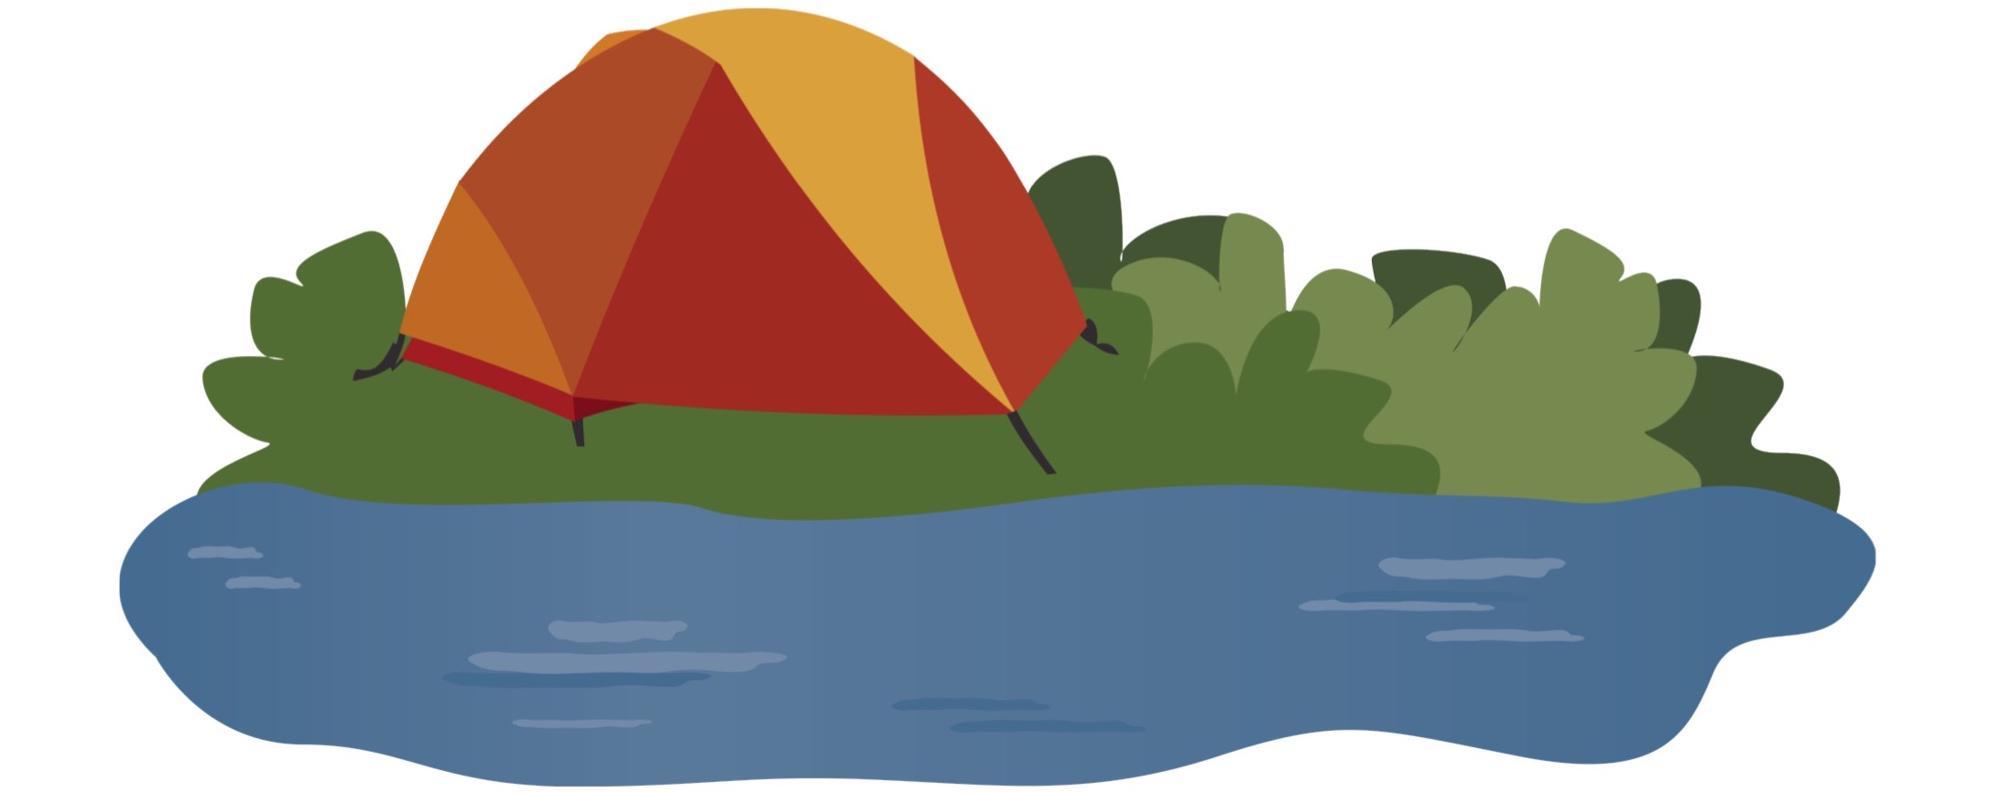 Small Tent illustration